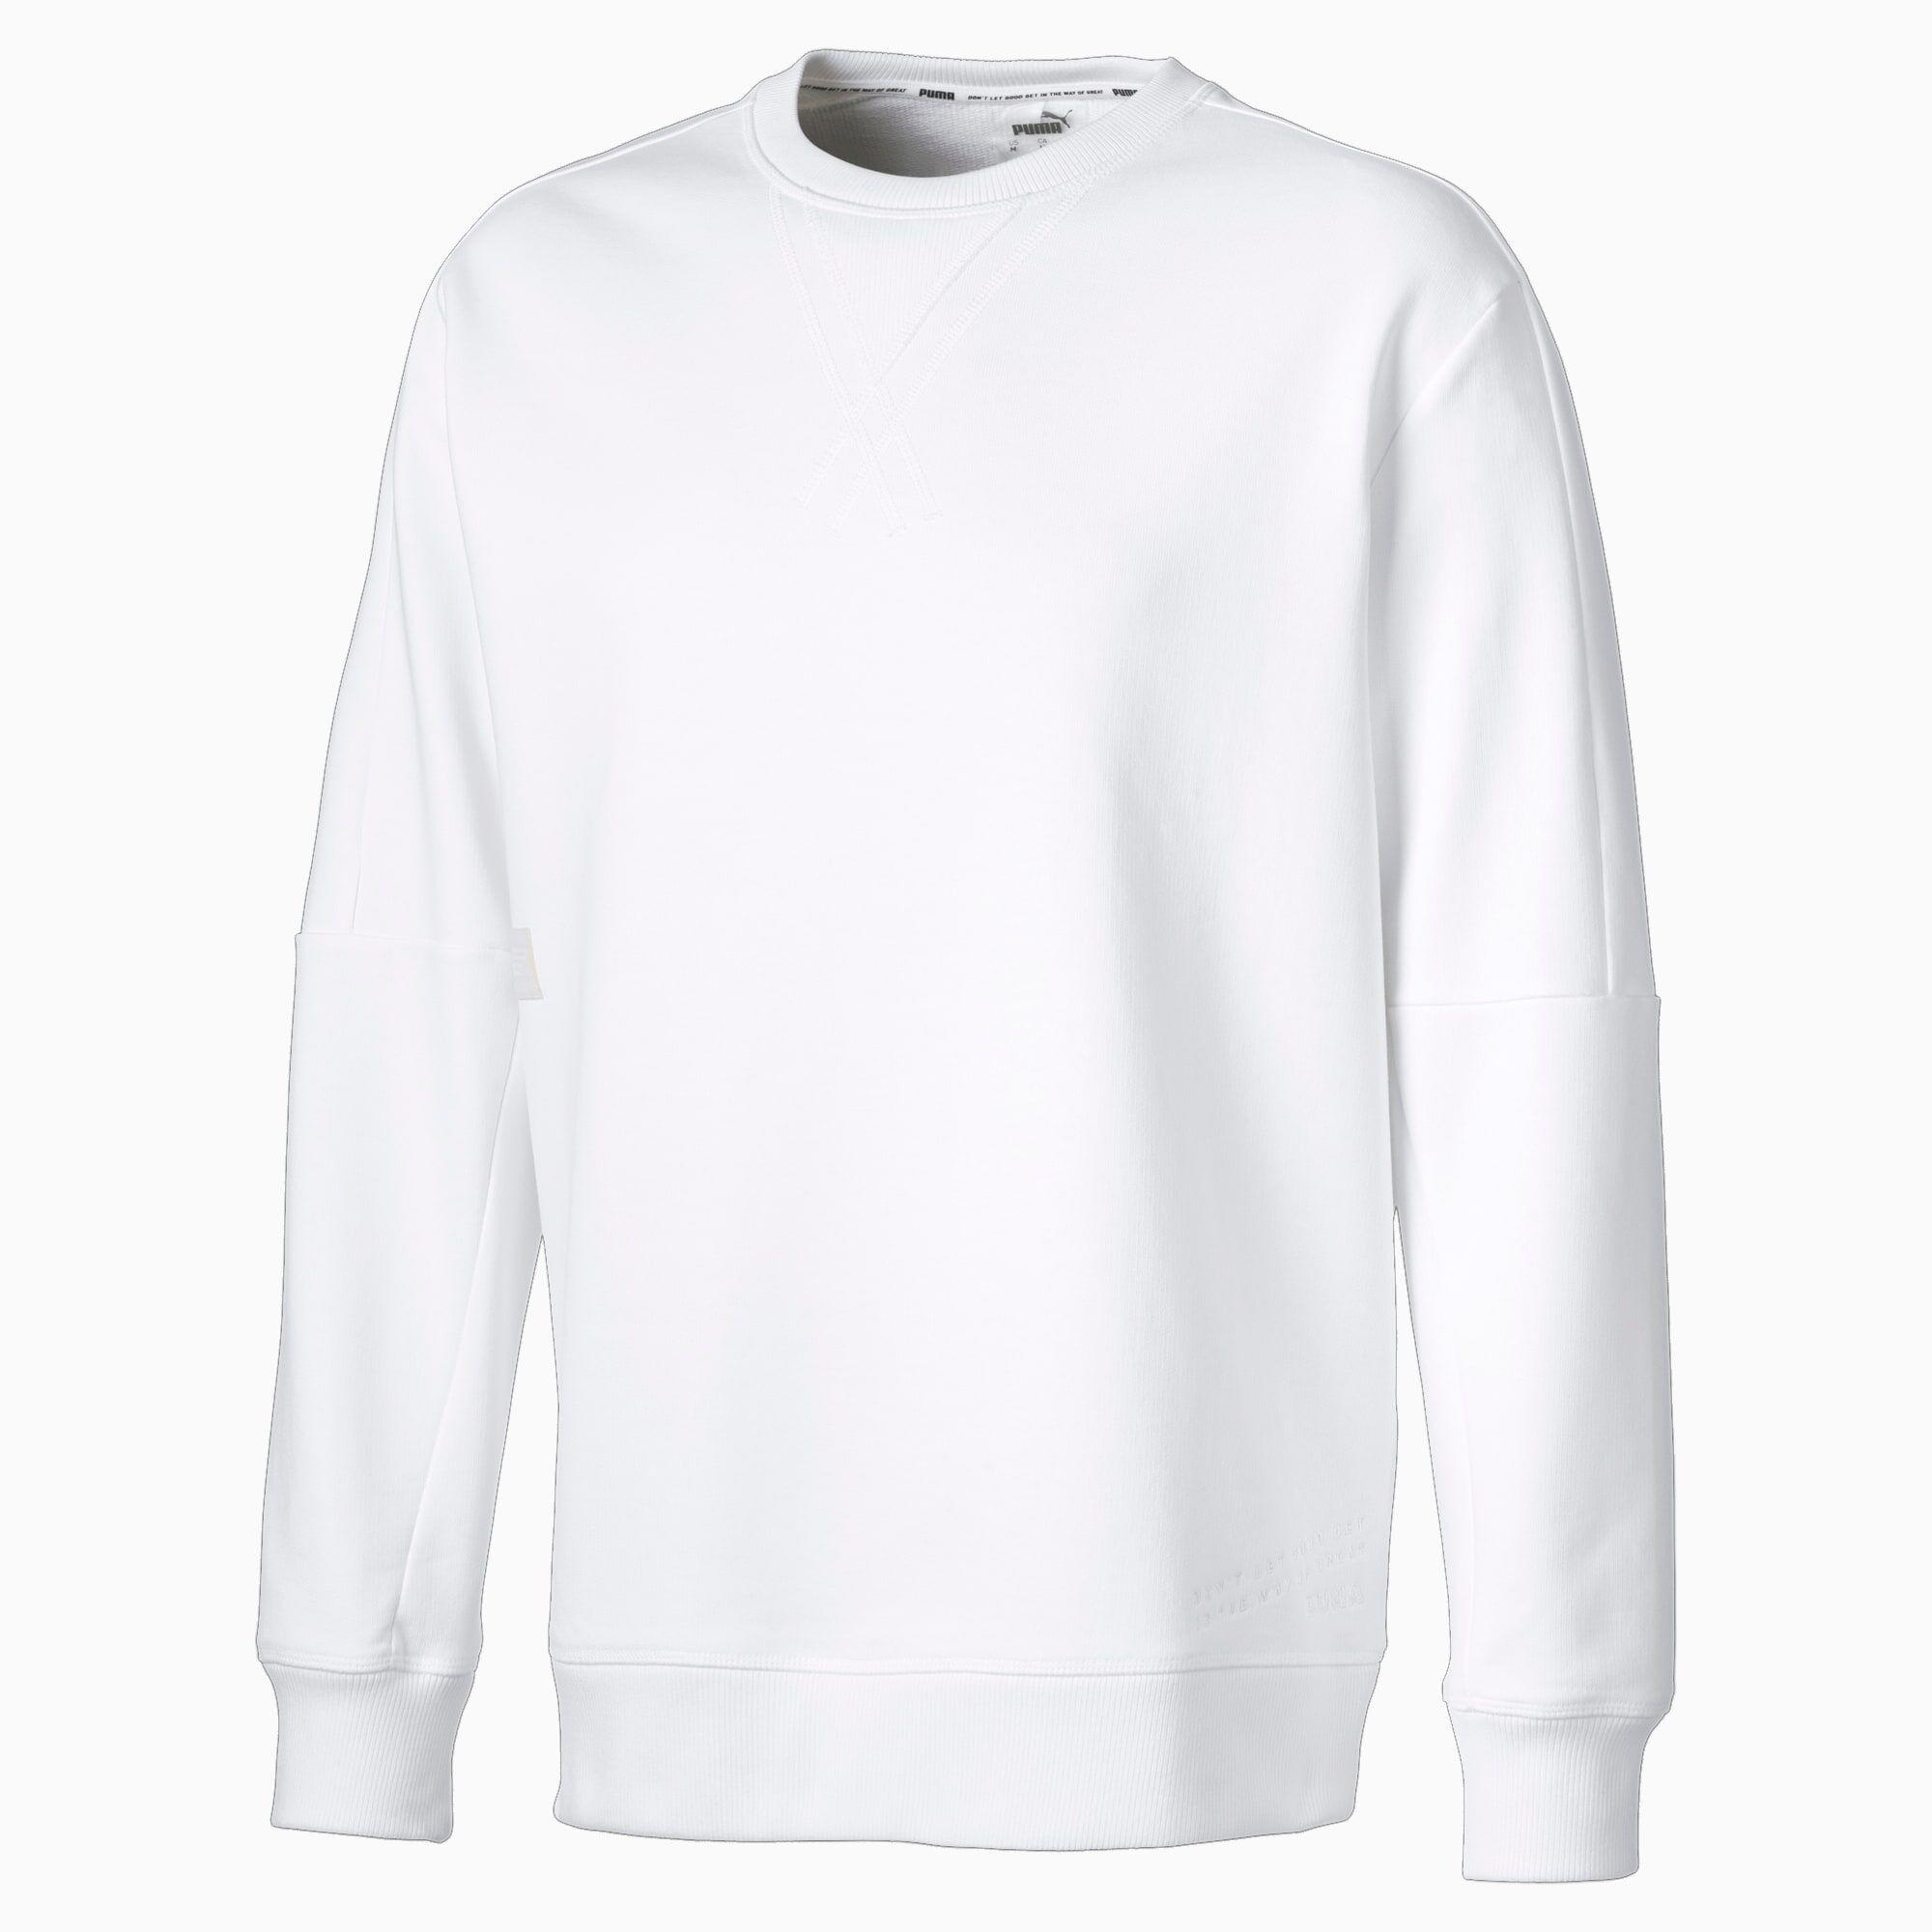 PUMA Sweat Jump Hook Basketball pour Homme, Blanc, Taille XL, Vêtements